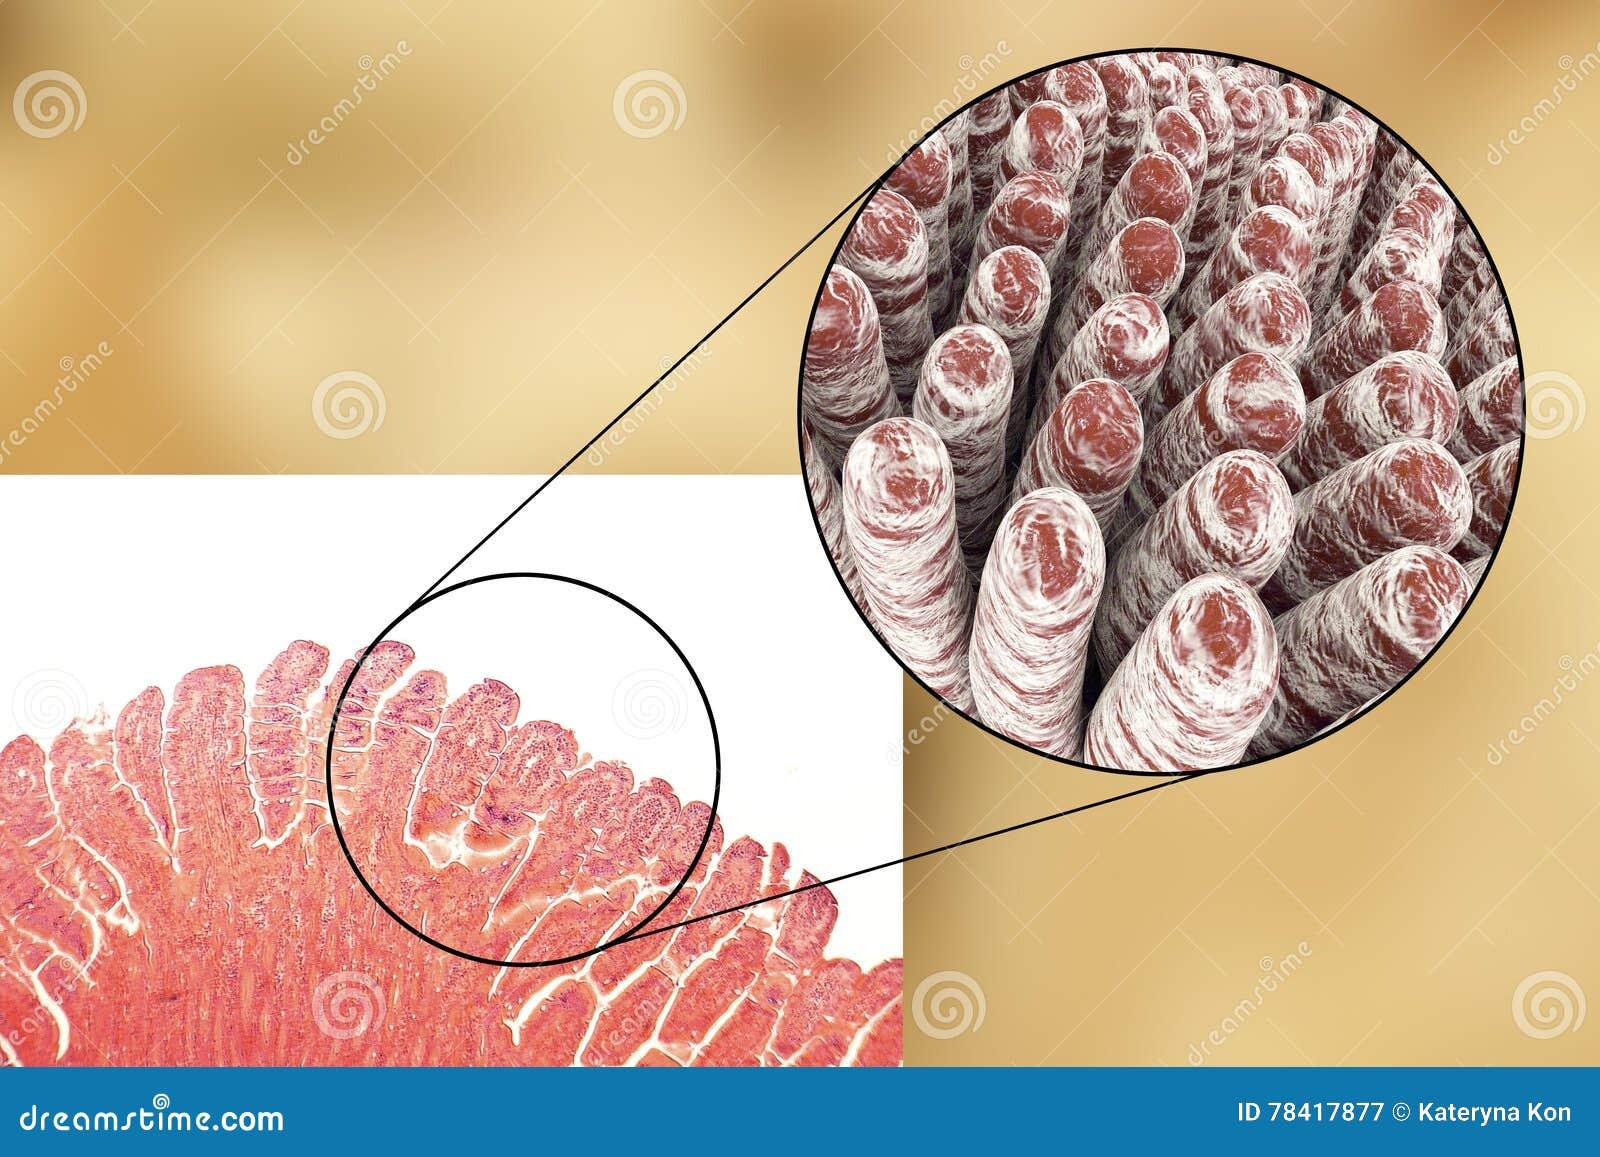 Villi Of Small Intestine Stock Illustration Illustration Of